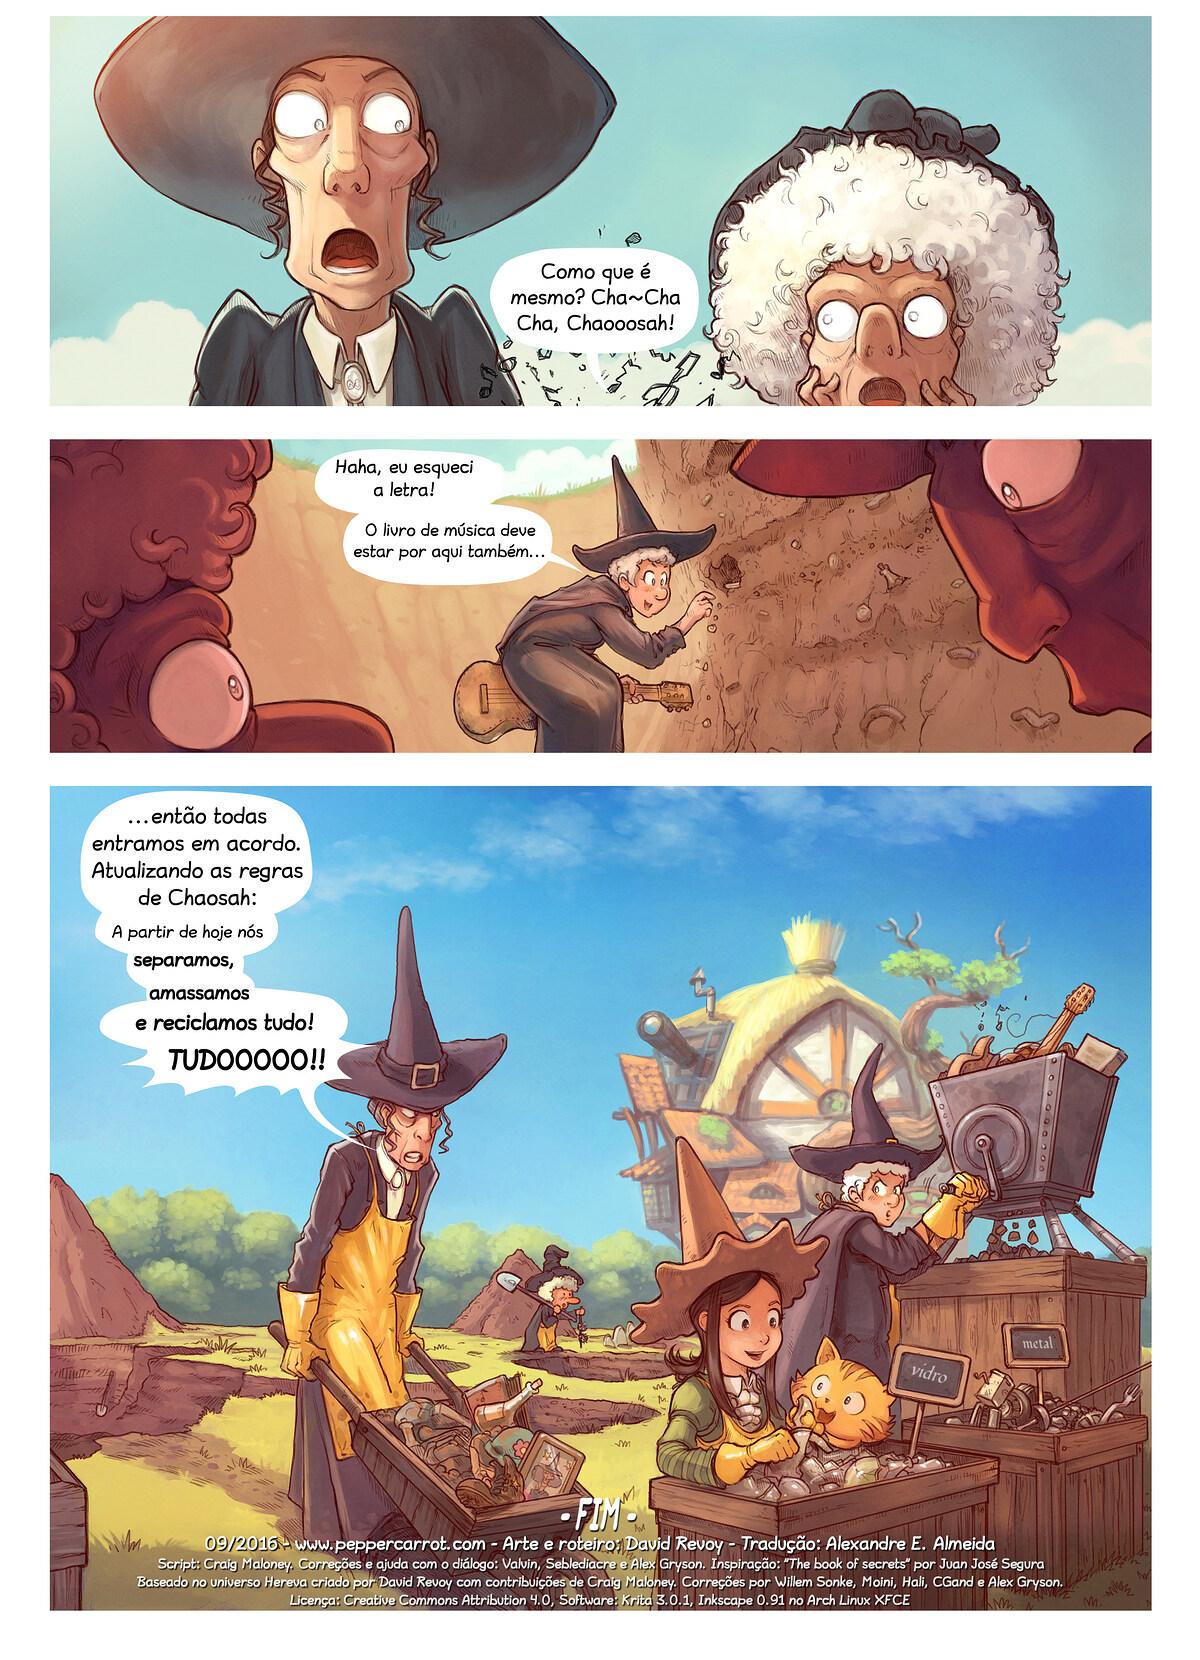 A webcomic page of Pepper&Carrot, episódio 19 [pt], página 7